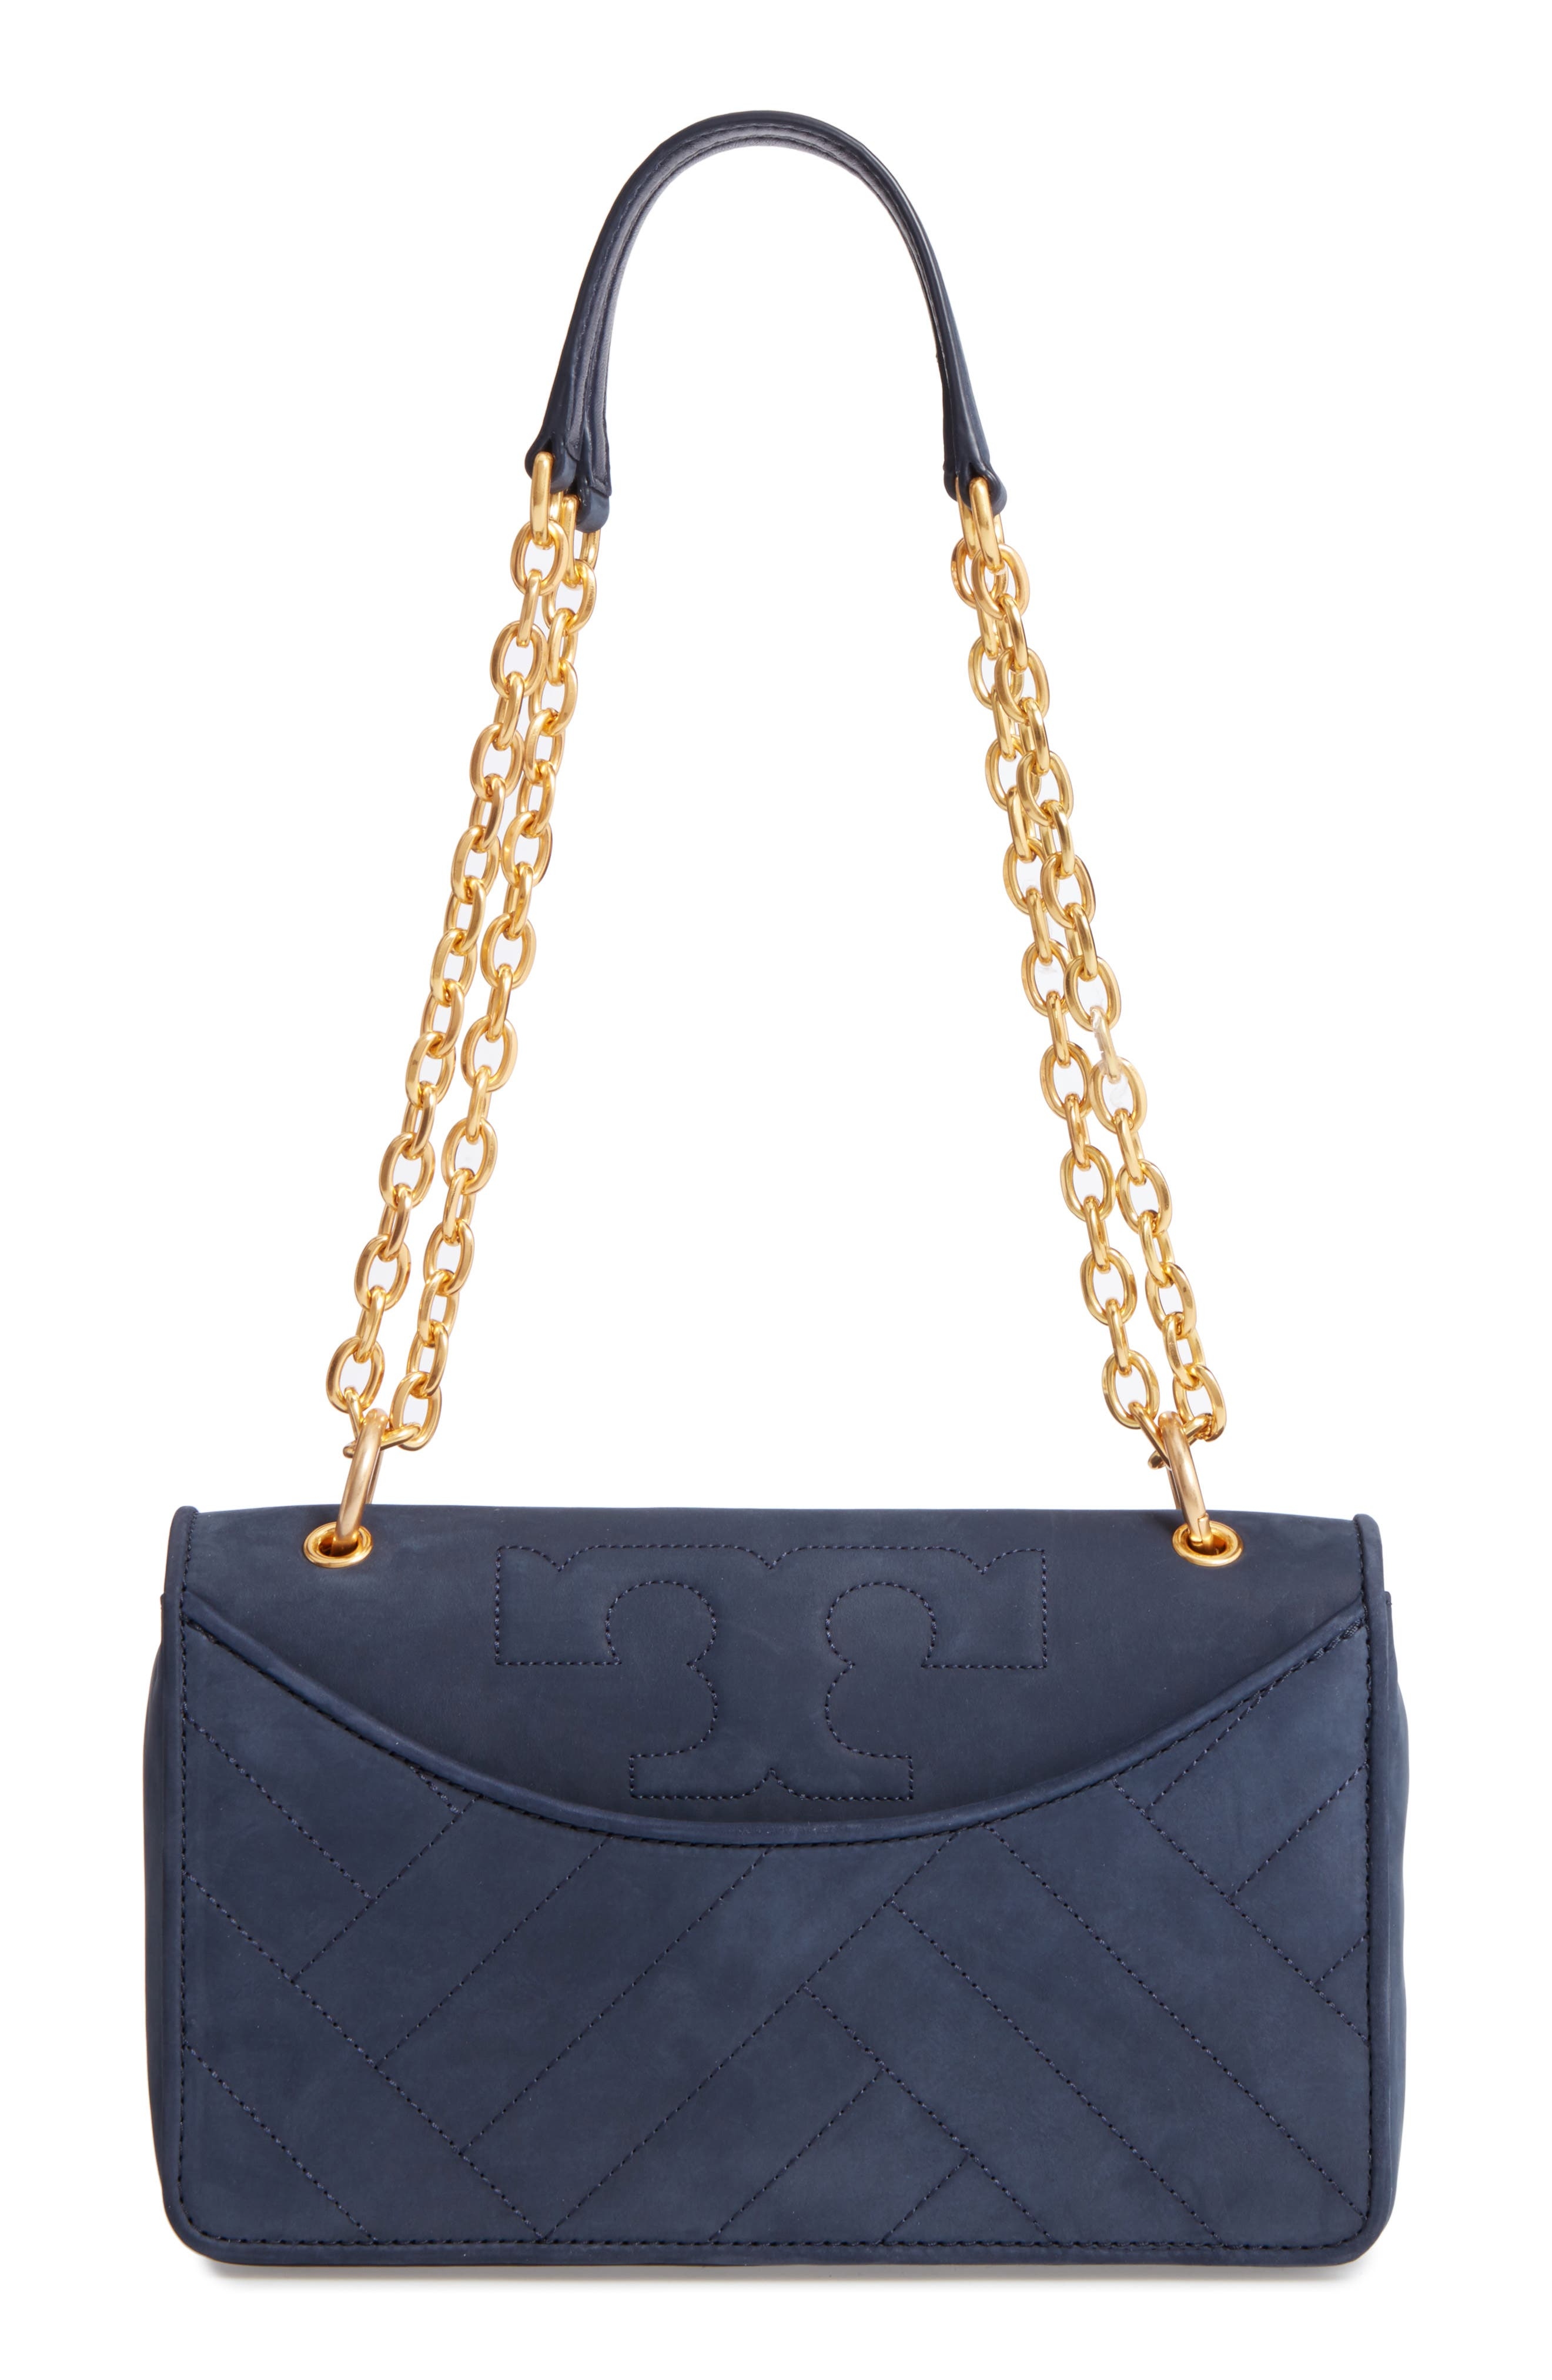 Alexa Leather Shoulder Bag,                             Main thumbnail 1, color,                             403